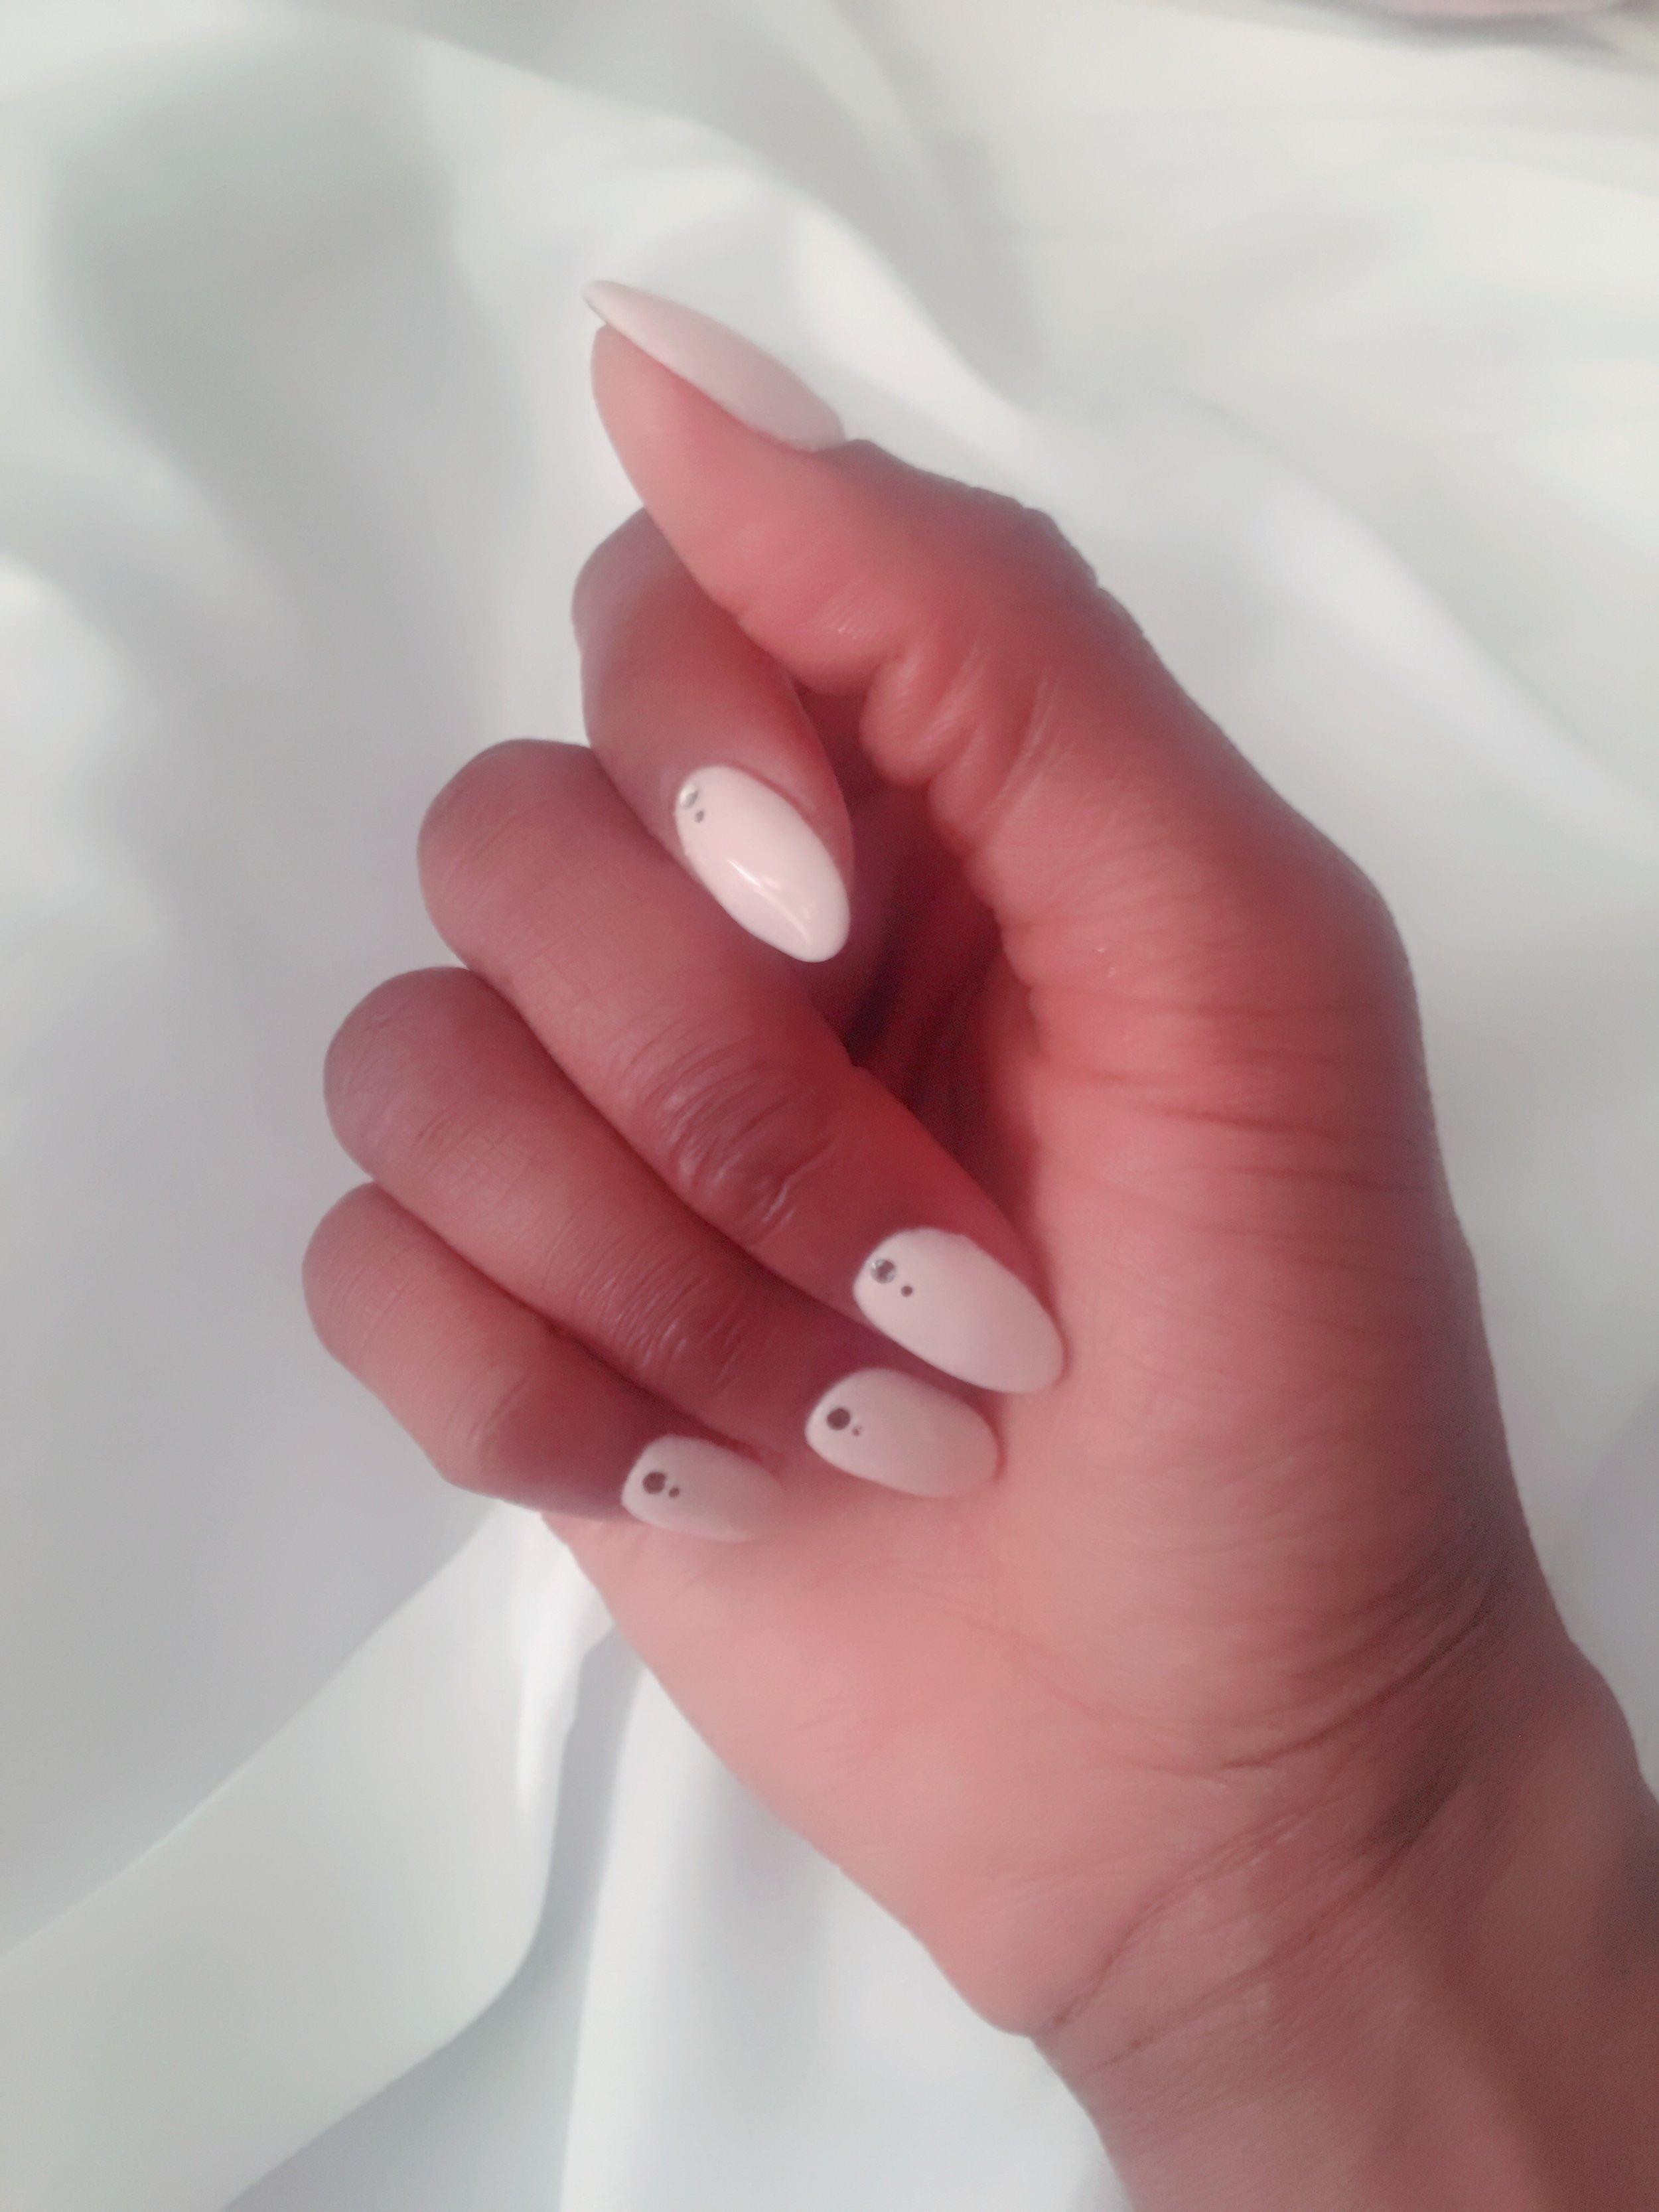 Manicure Courtesy of M&M Studio